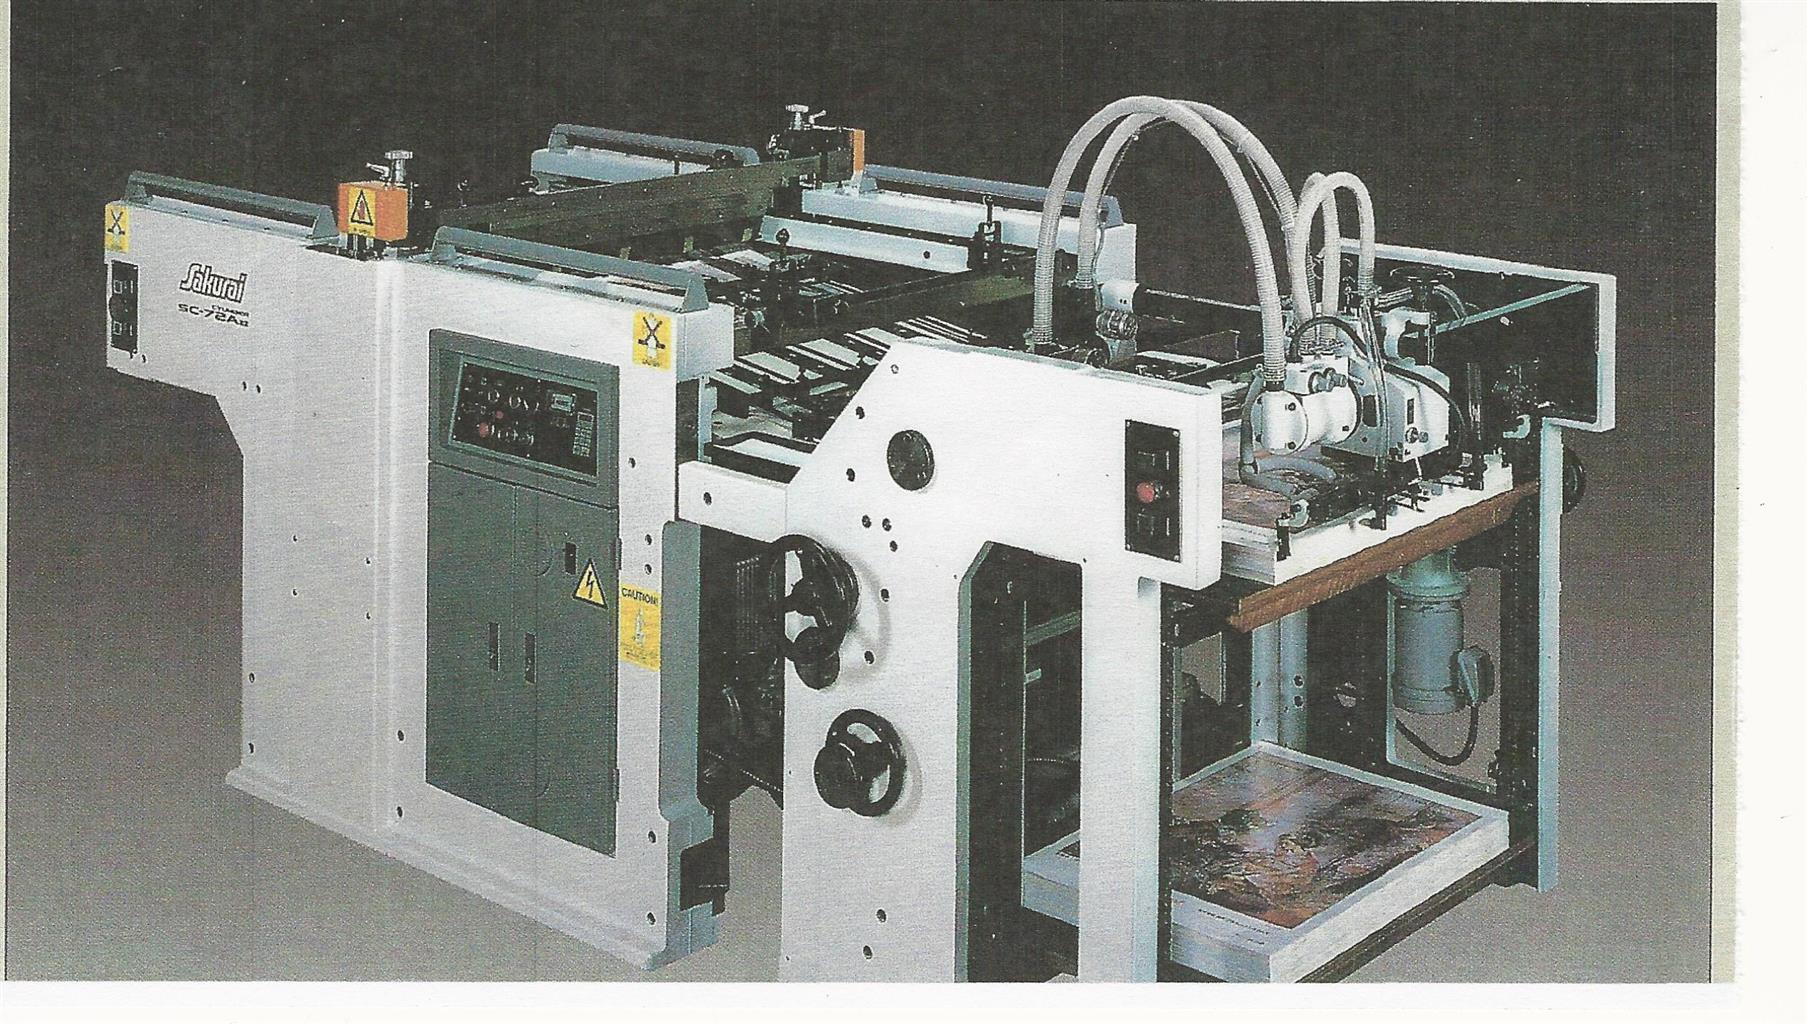 1995, SAKURAI - SC102A11 - SPOT COATING LINE